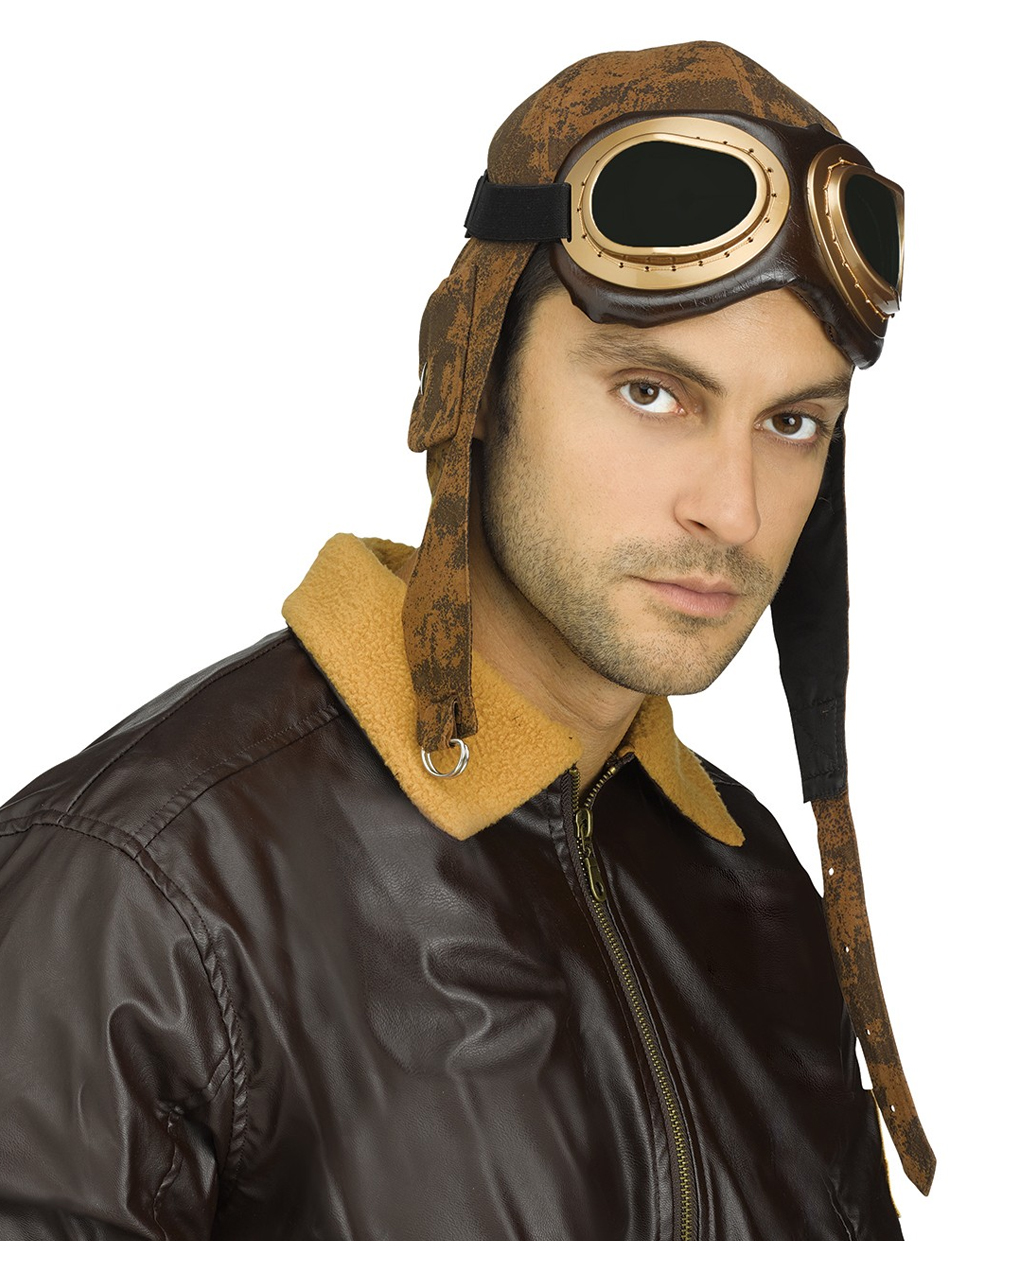 Aviator aviator cap with glasses Costume Accessories  057bf8f1687